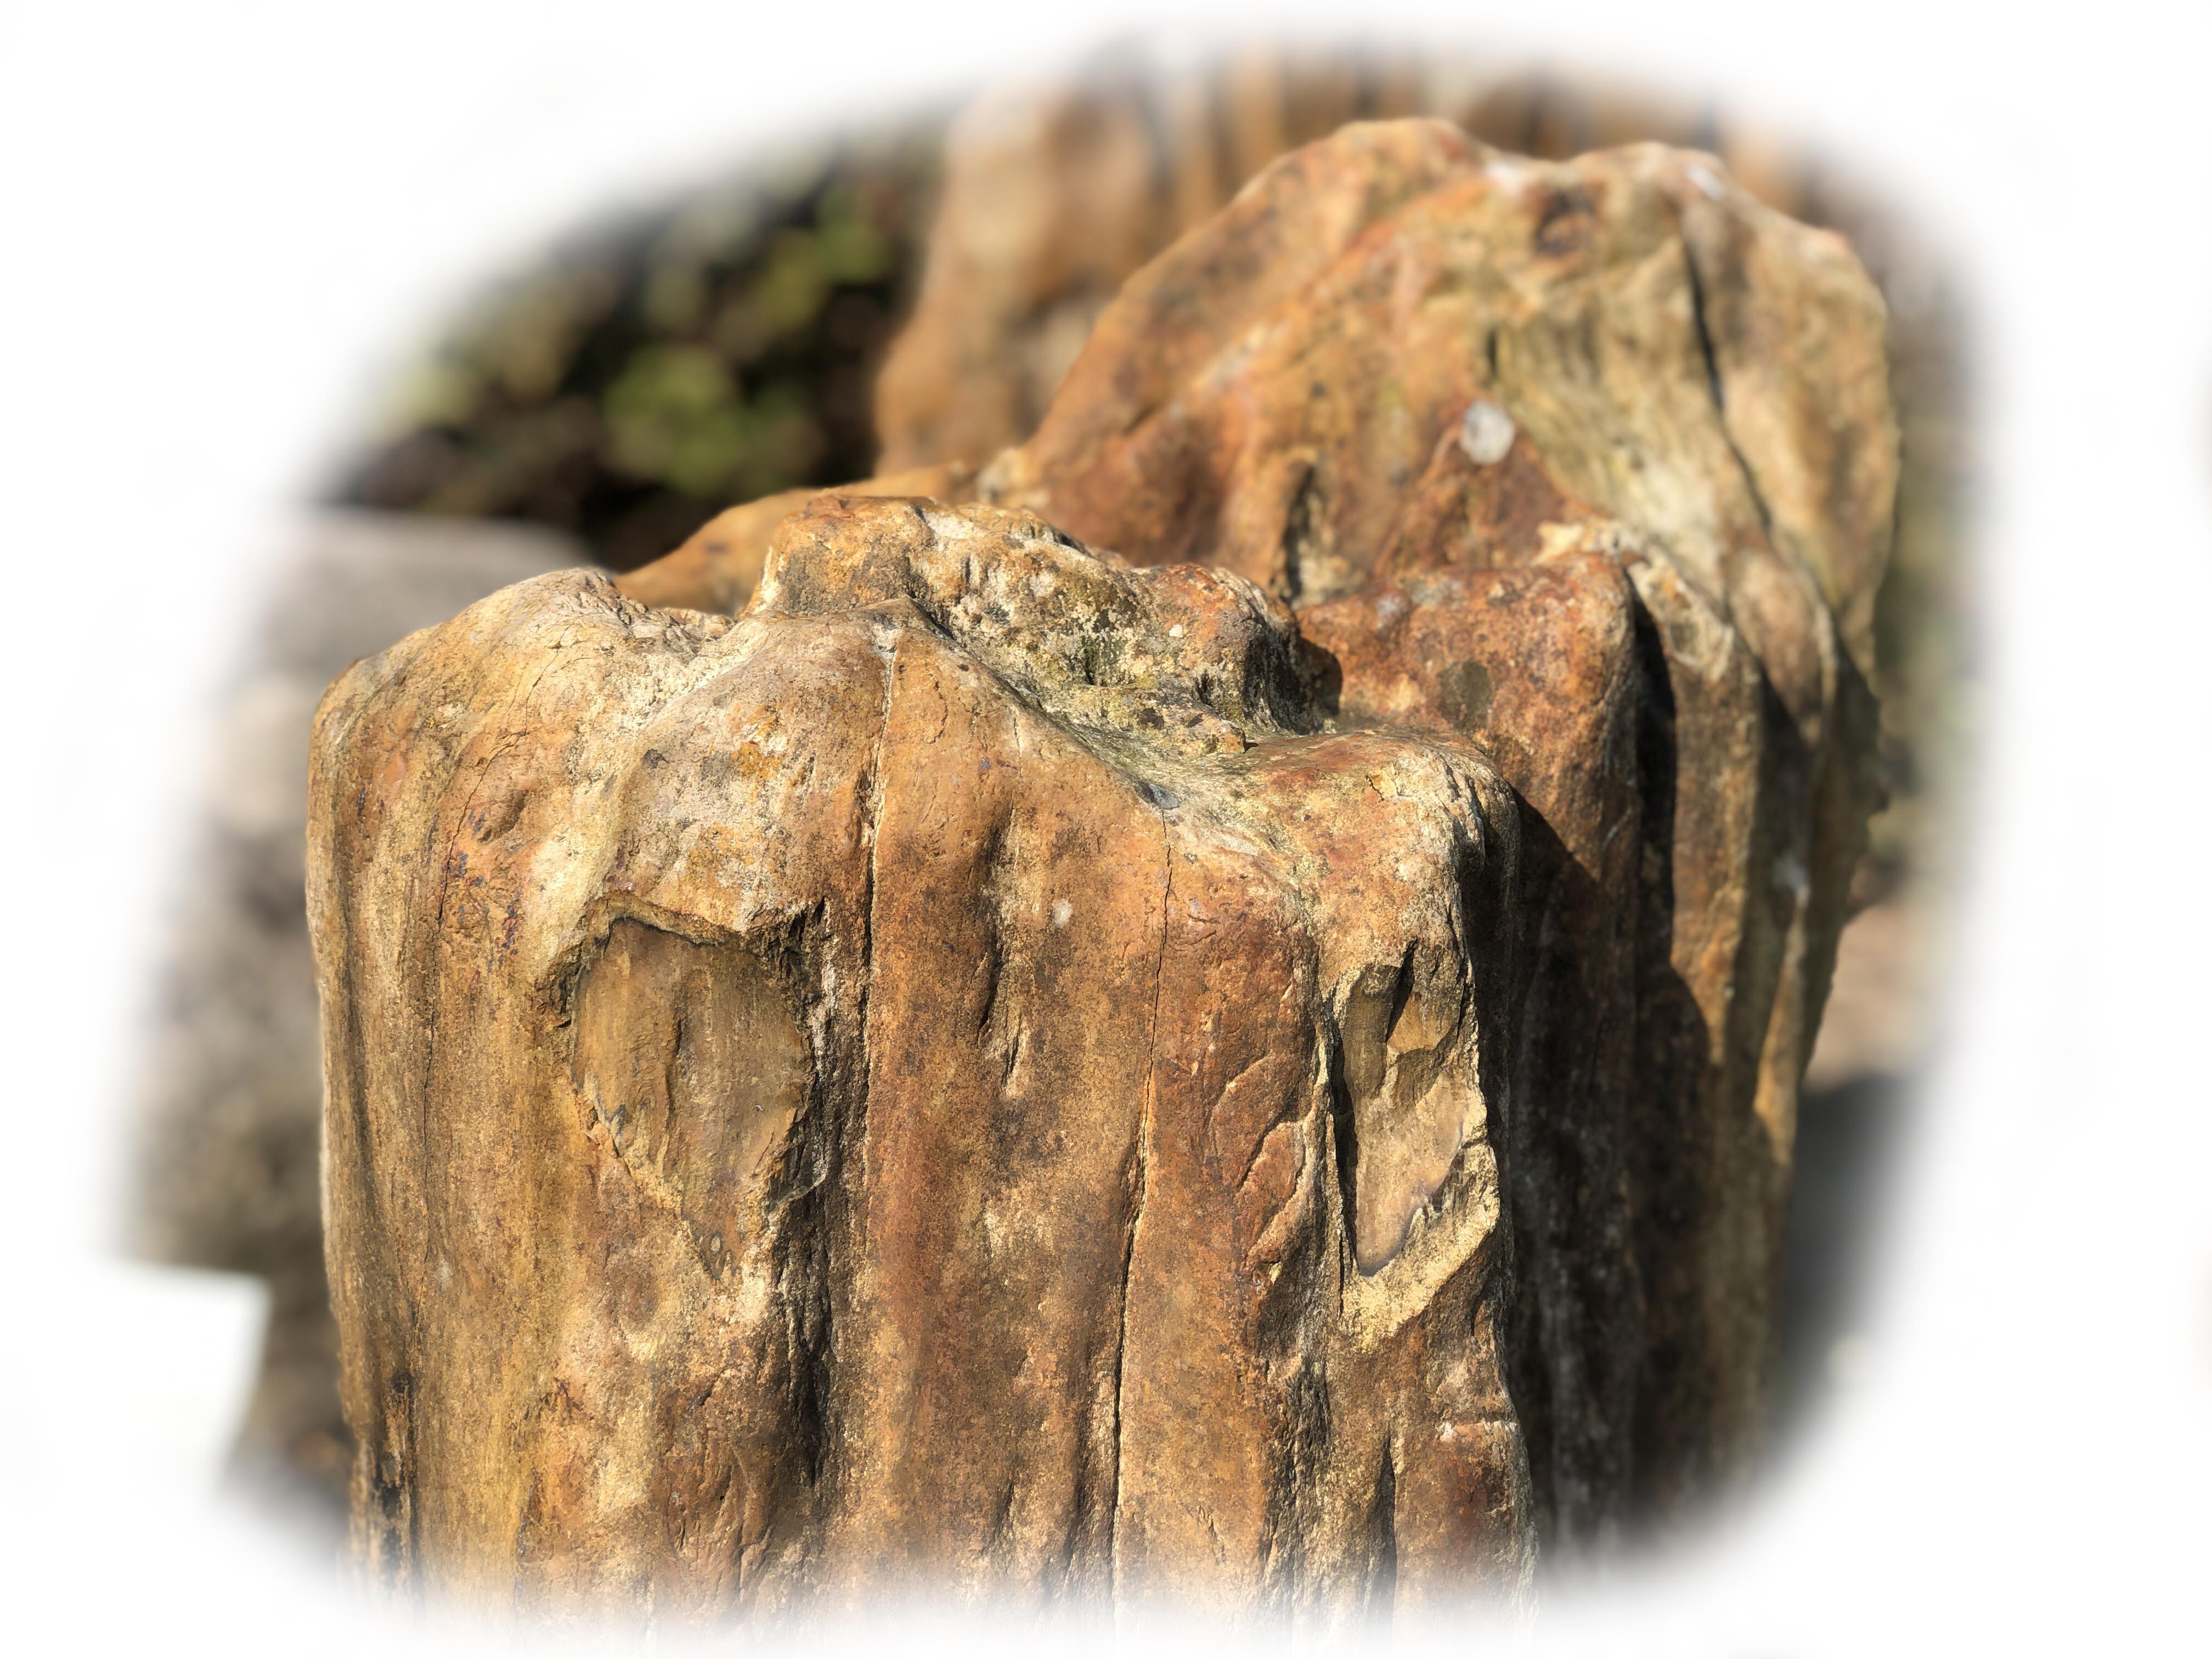 Versteend hout K-132